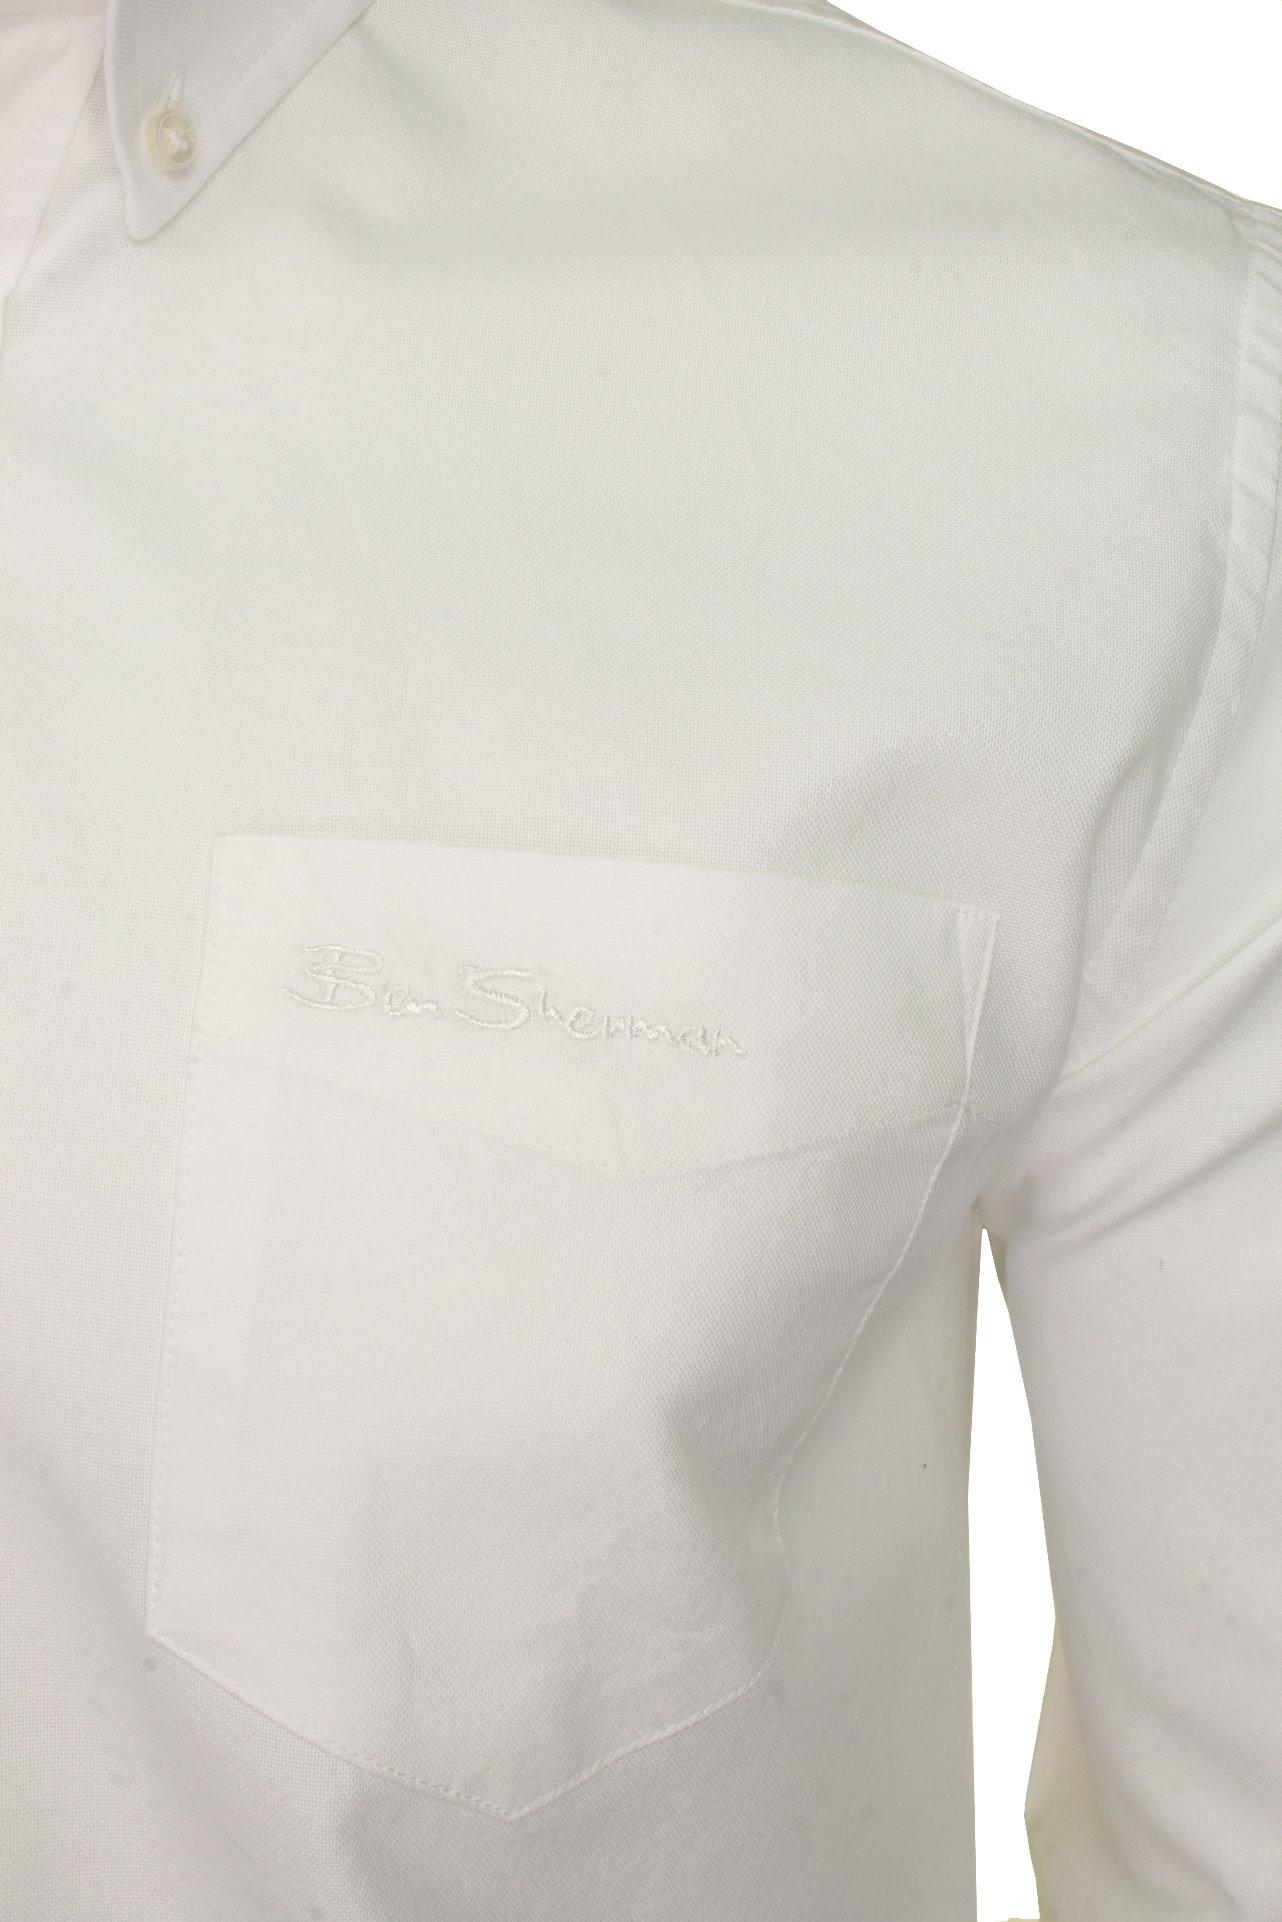 Mens-Oxford-Shirt-by-Ben-Sherman-Long-Sleeved thumbnail 44